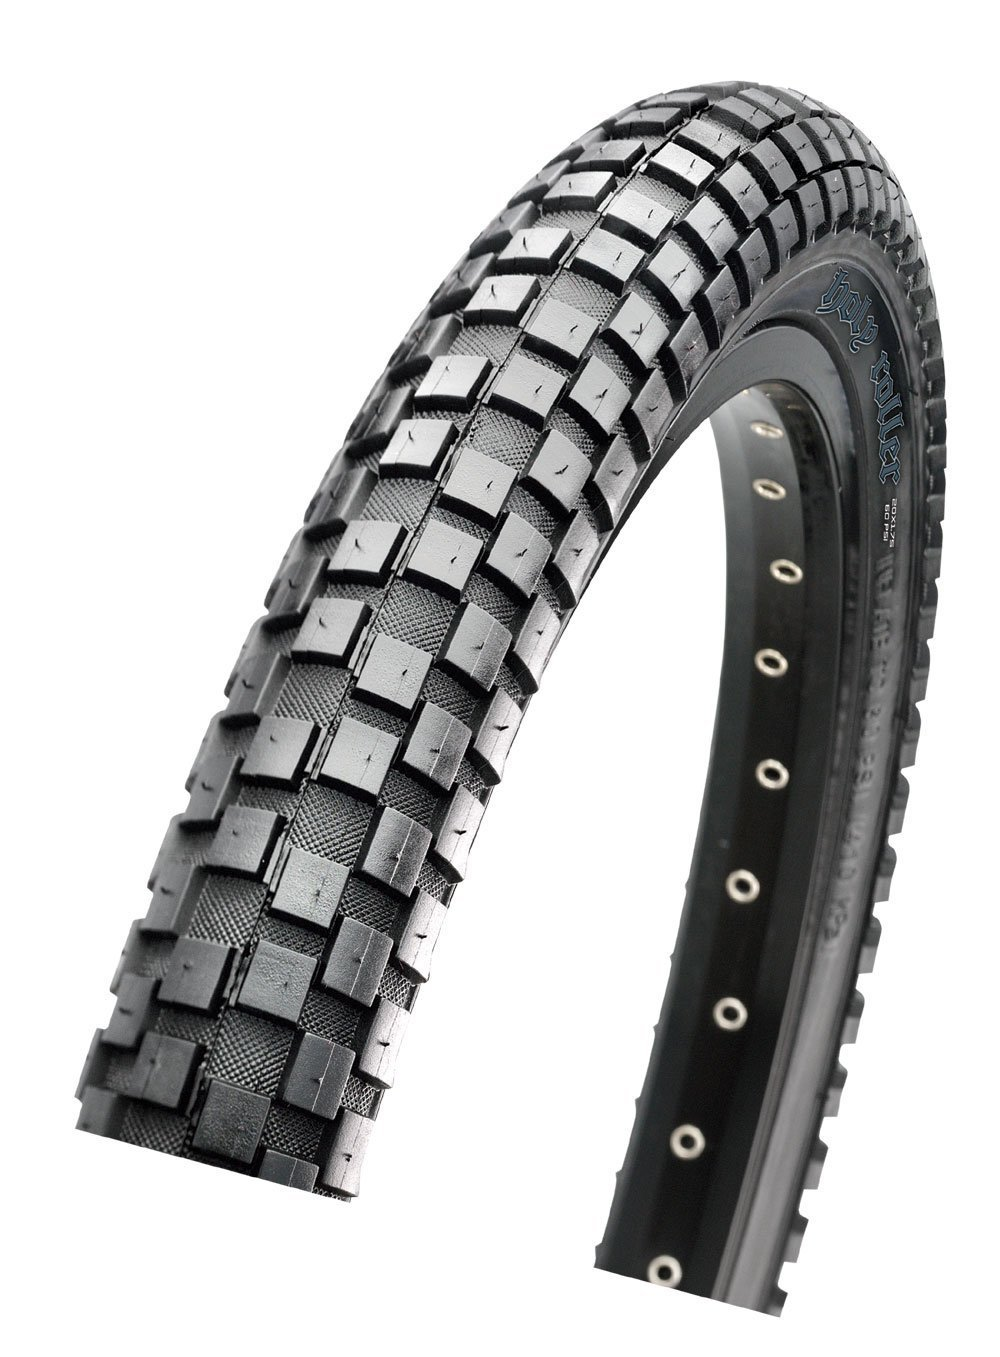 Maxxis Holy Roller BMX/Urban Bike Tire (Wire Beaded 60a 26x2.4) [並行輸入品] B077QQR652